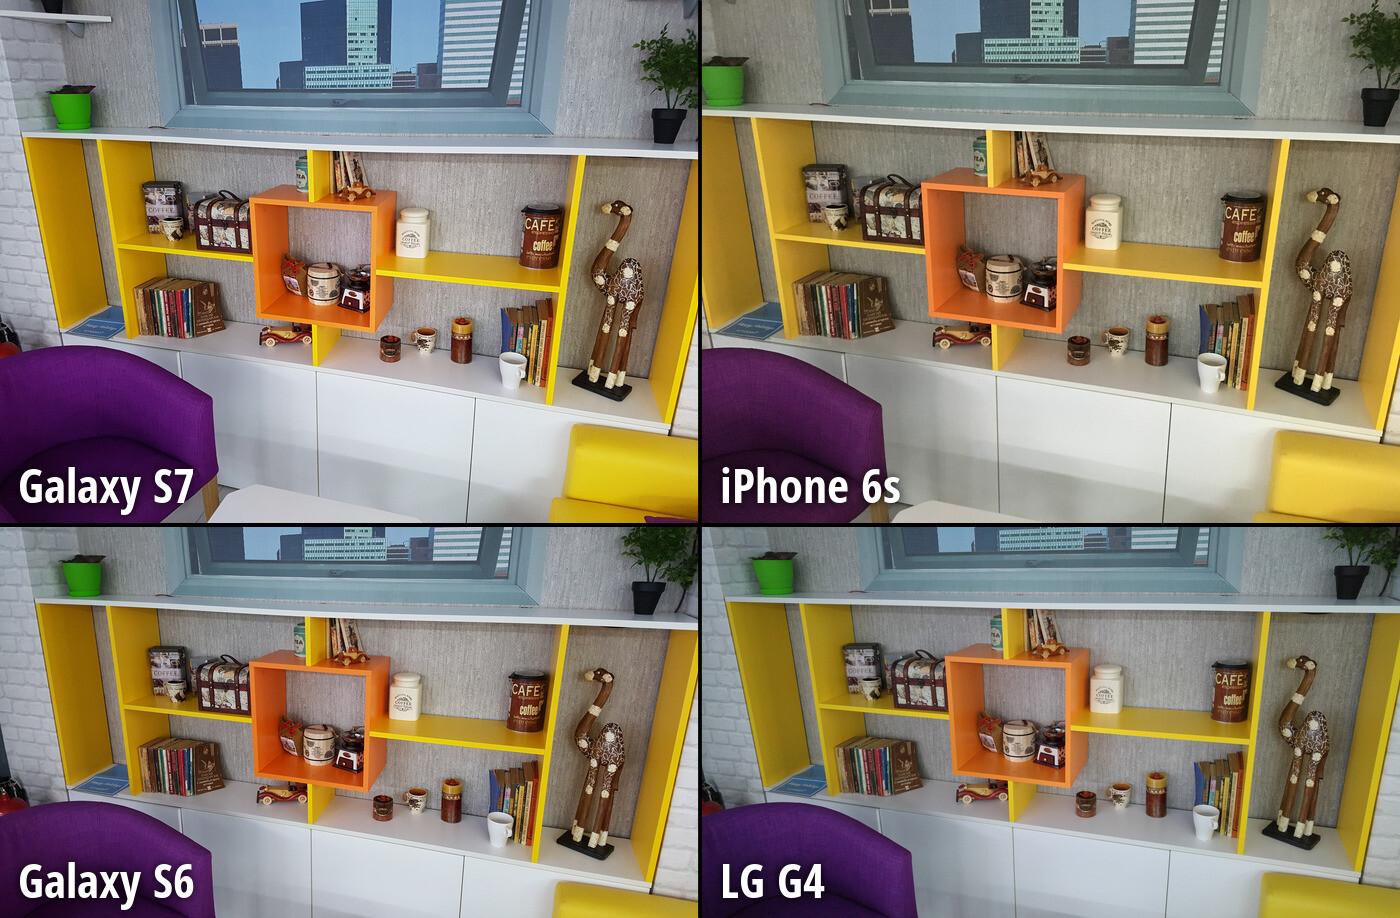 camera iphone 6s vs samsung s7